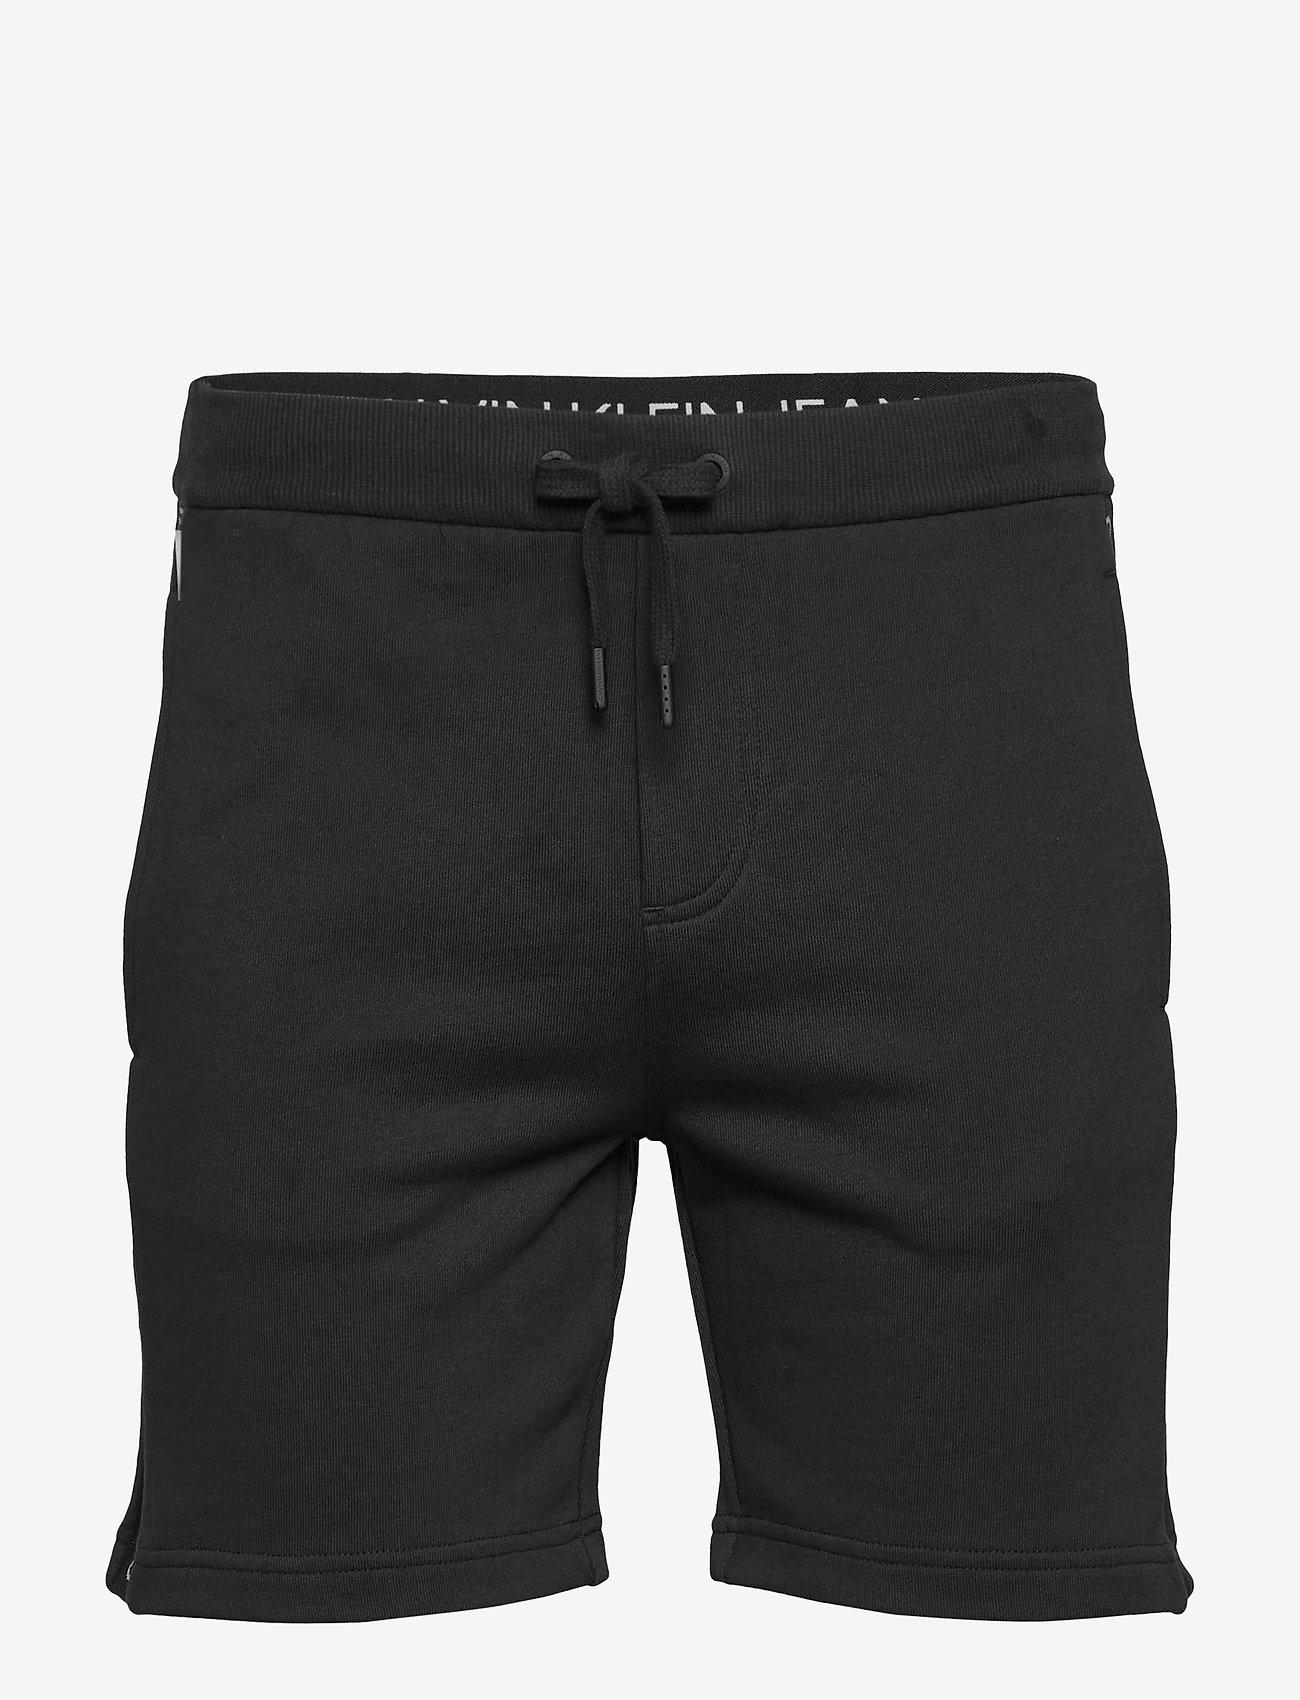 Calvin Klein Jeans - SIDE LOGO HWK SHORT - casual shorts - ck black - 0